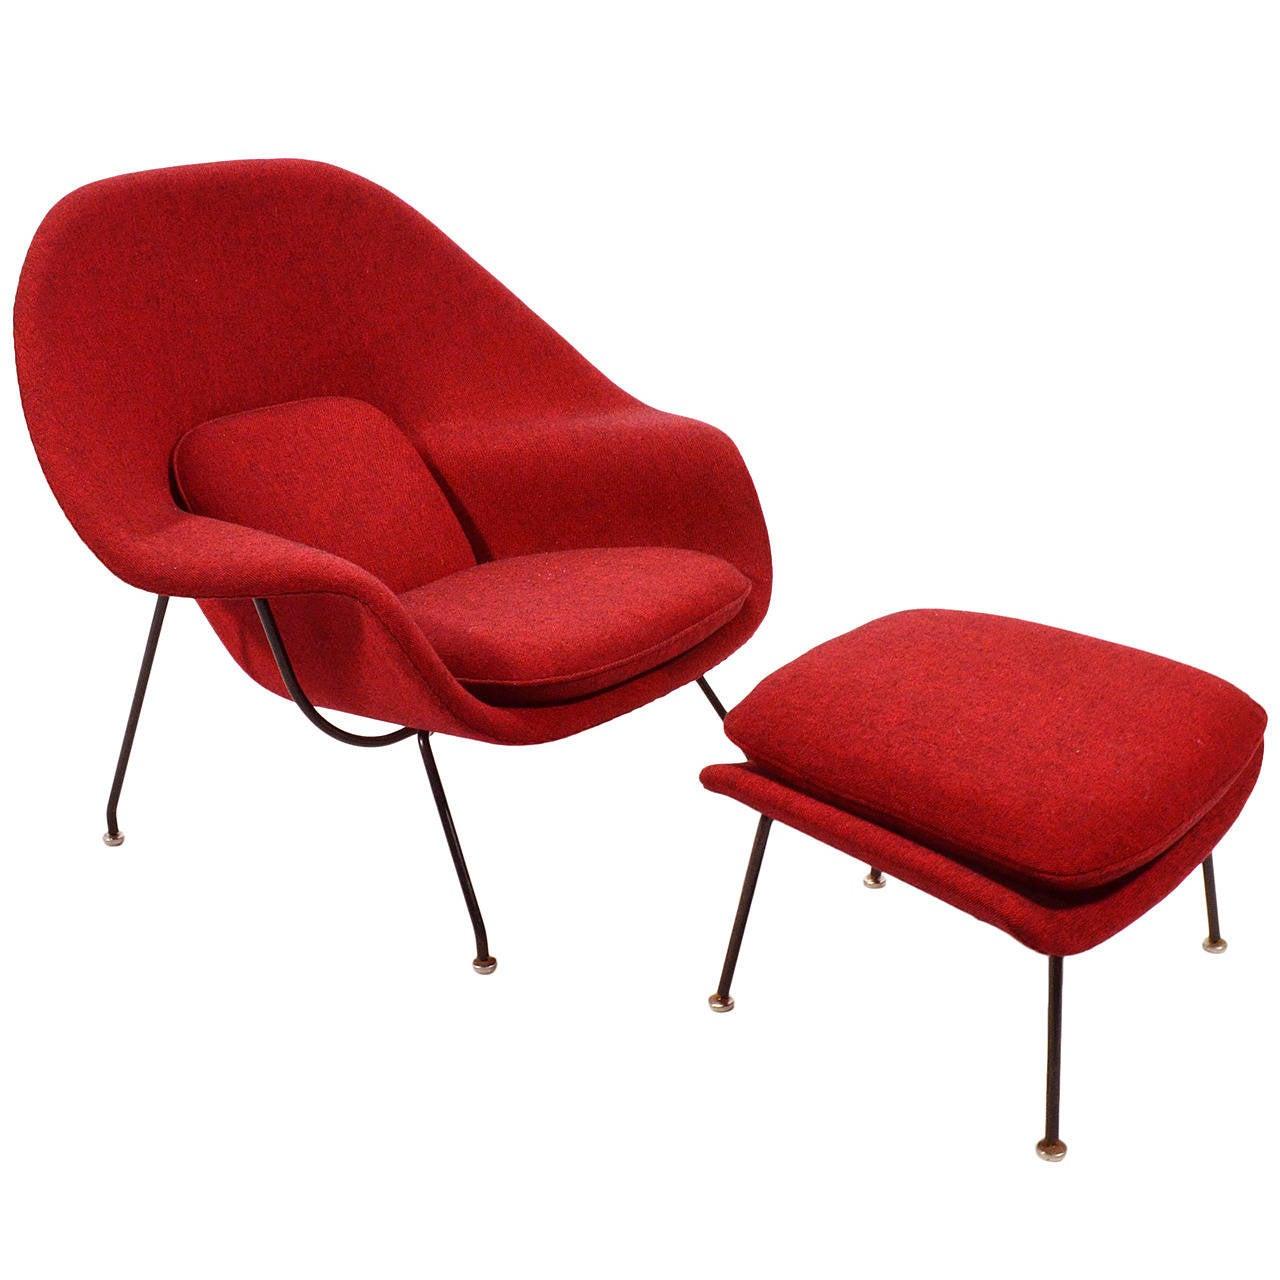 knoll saarinen chair purple lounge bedroom eero womb and ottoman upholstered in